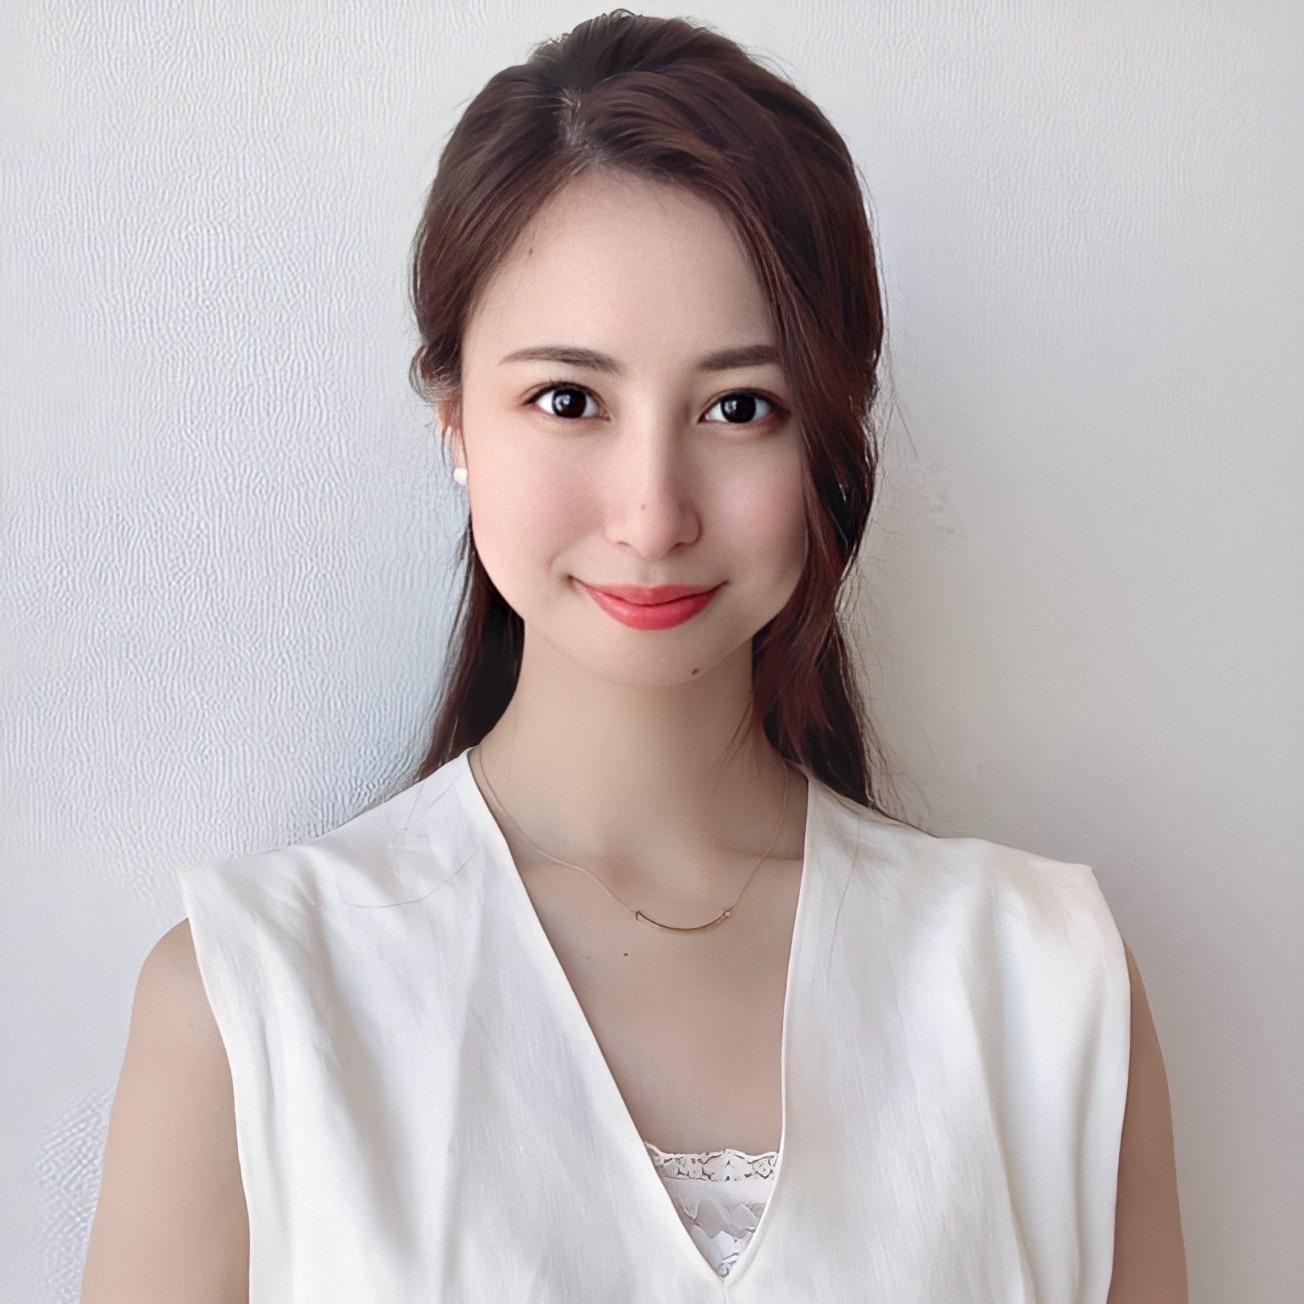 @chippp49 Profile Image | Linktree